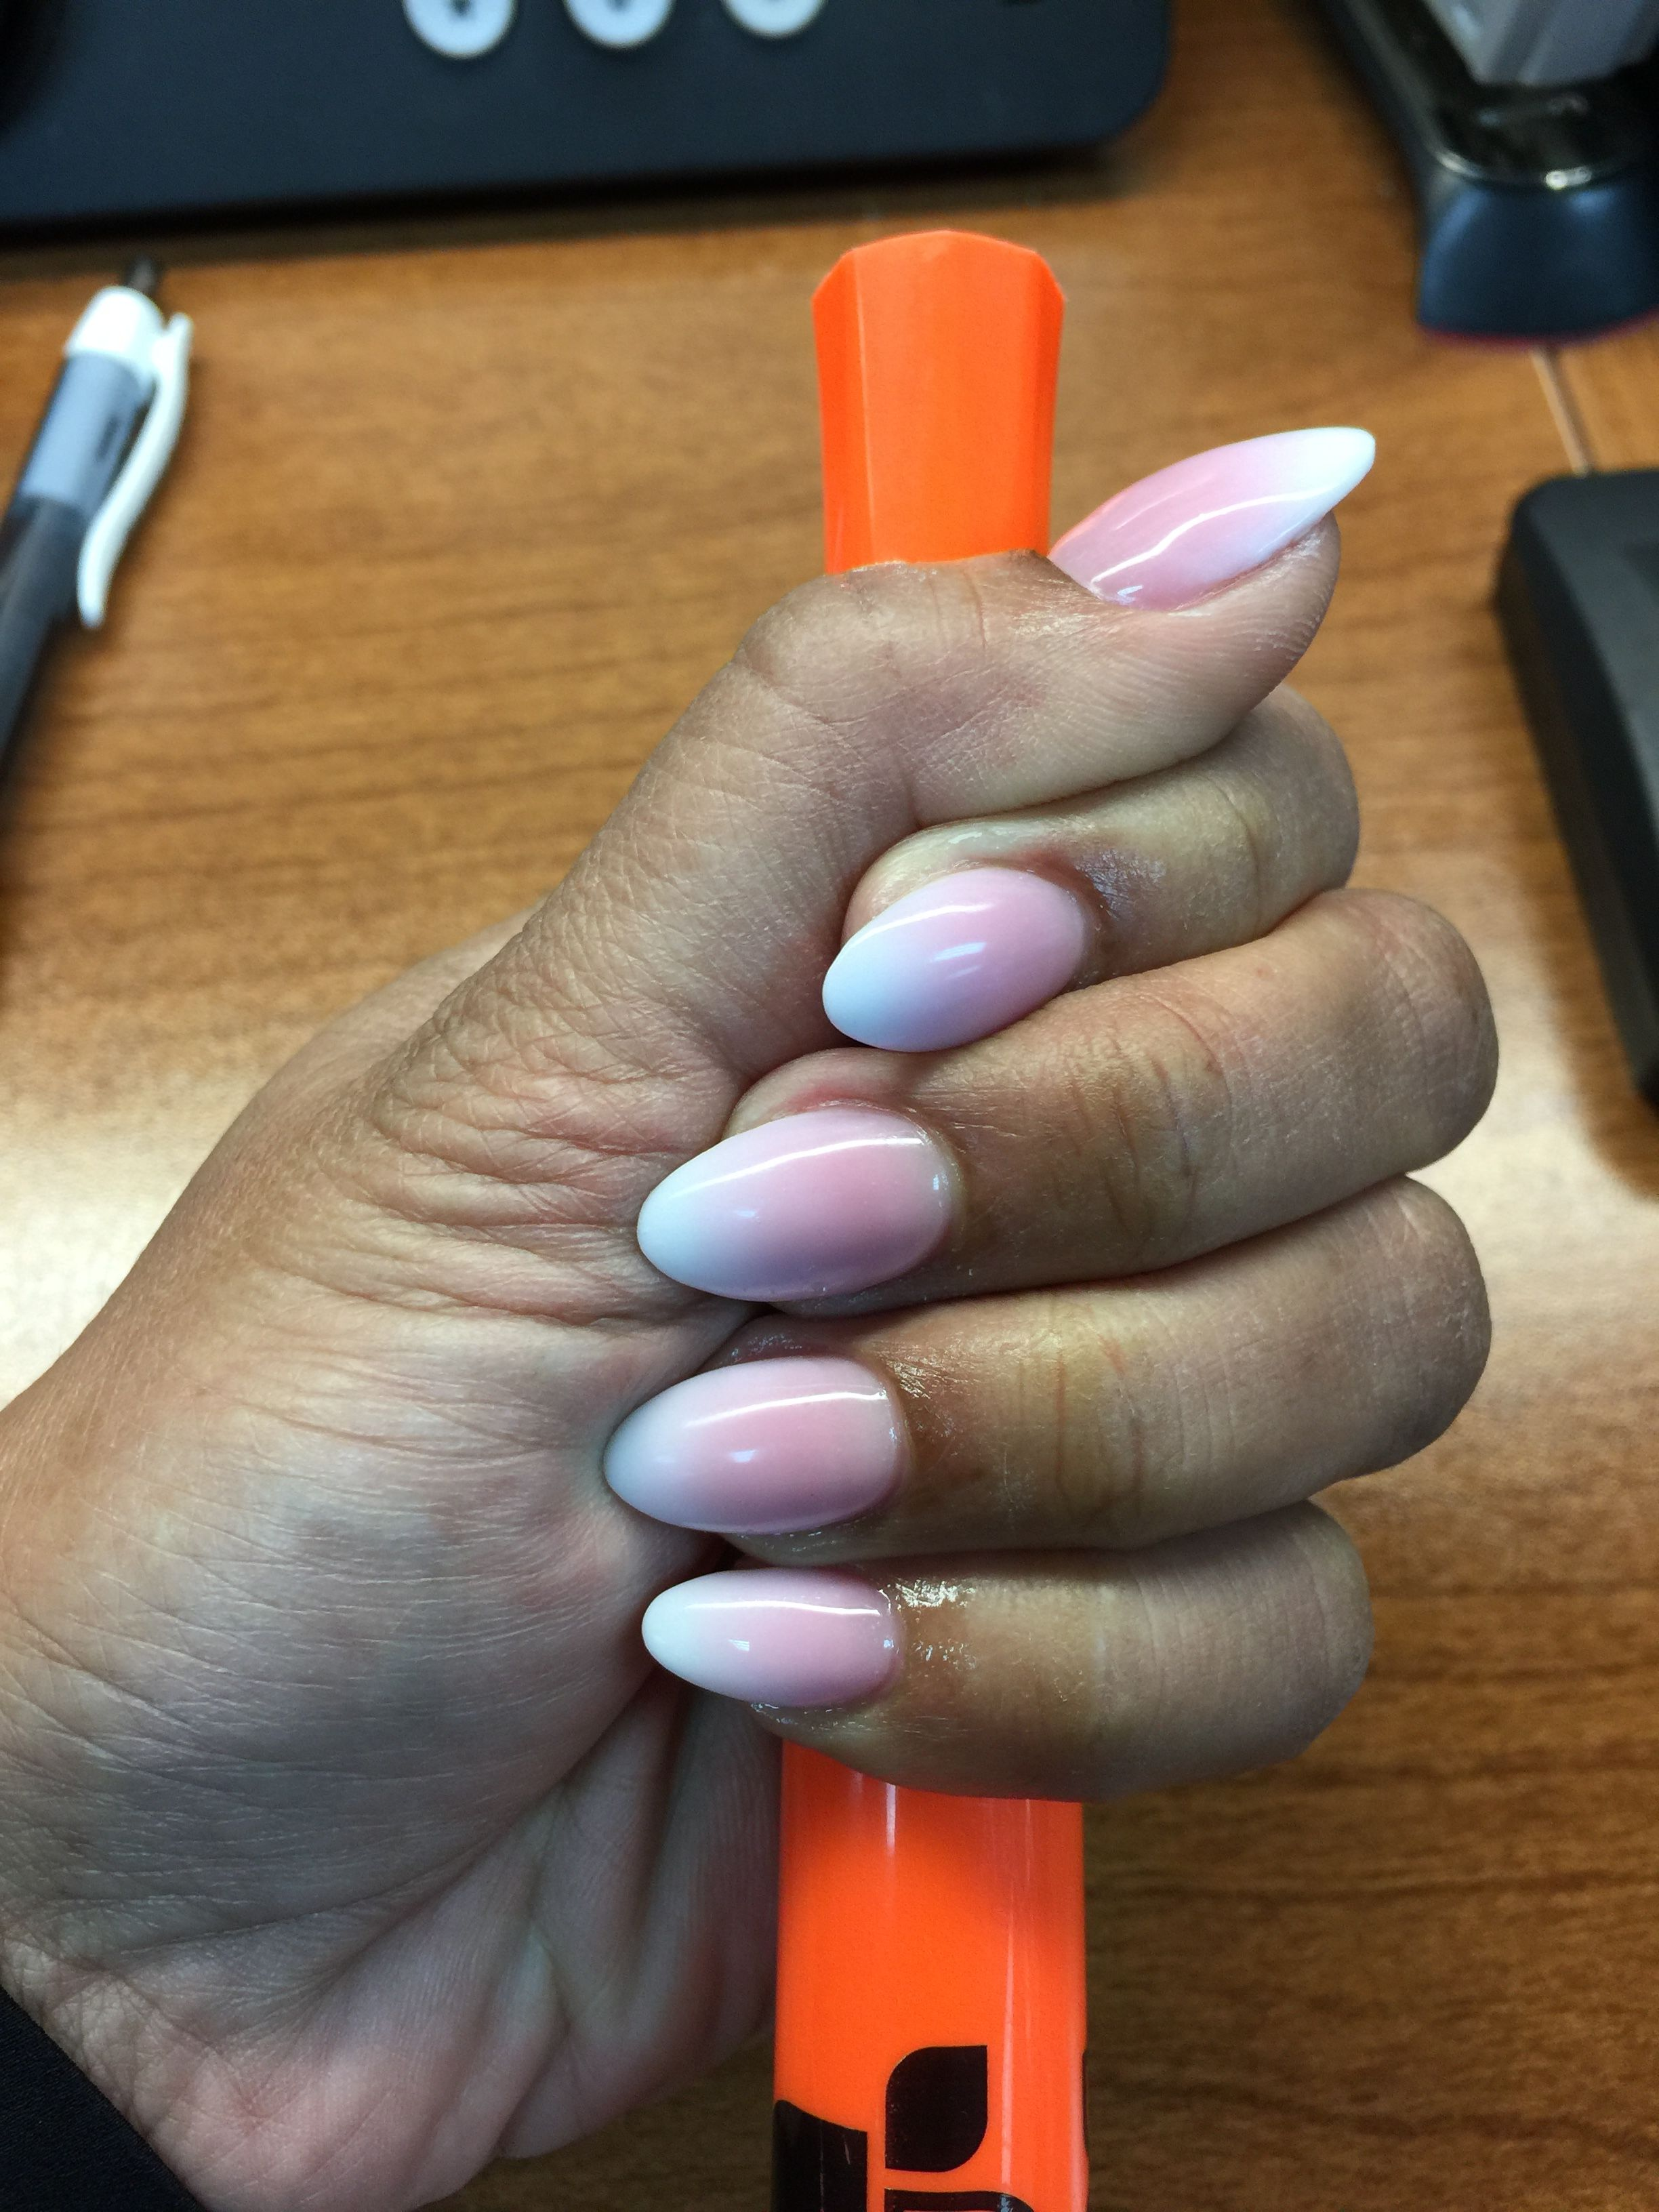 French Ombré Almond Shape Makeup nails, Almond nails